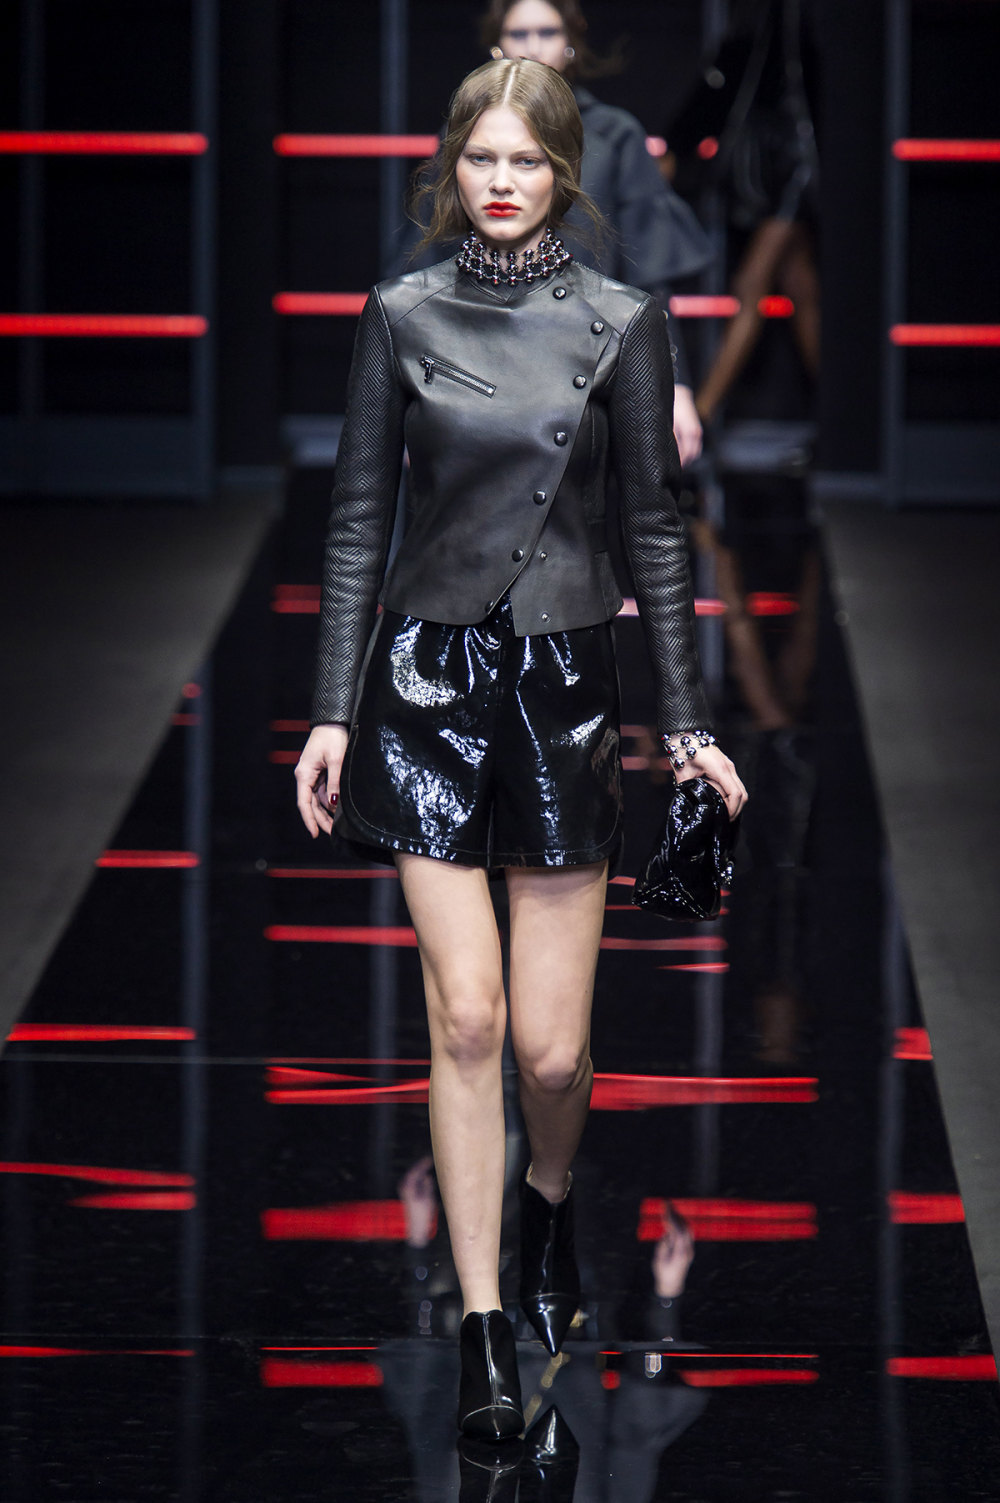 Emporio Armani时装系列畅的裤子带有柔滑裙子的鸡尾酒礼服-33.jpg